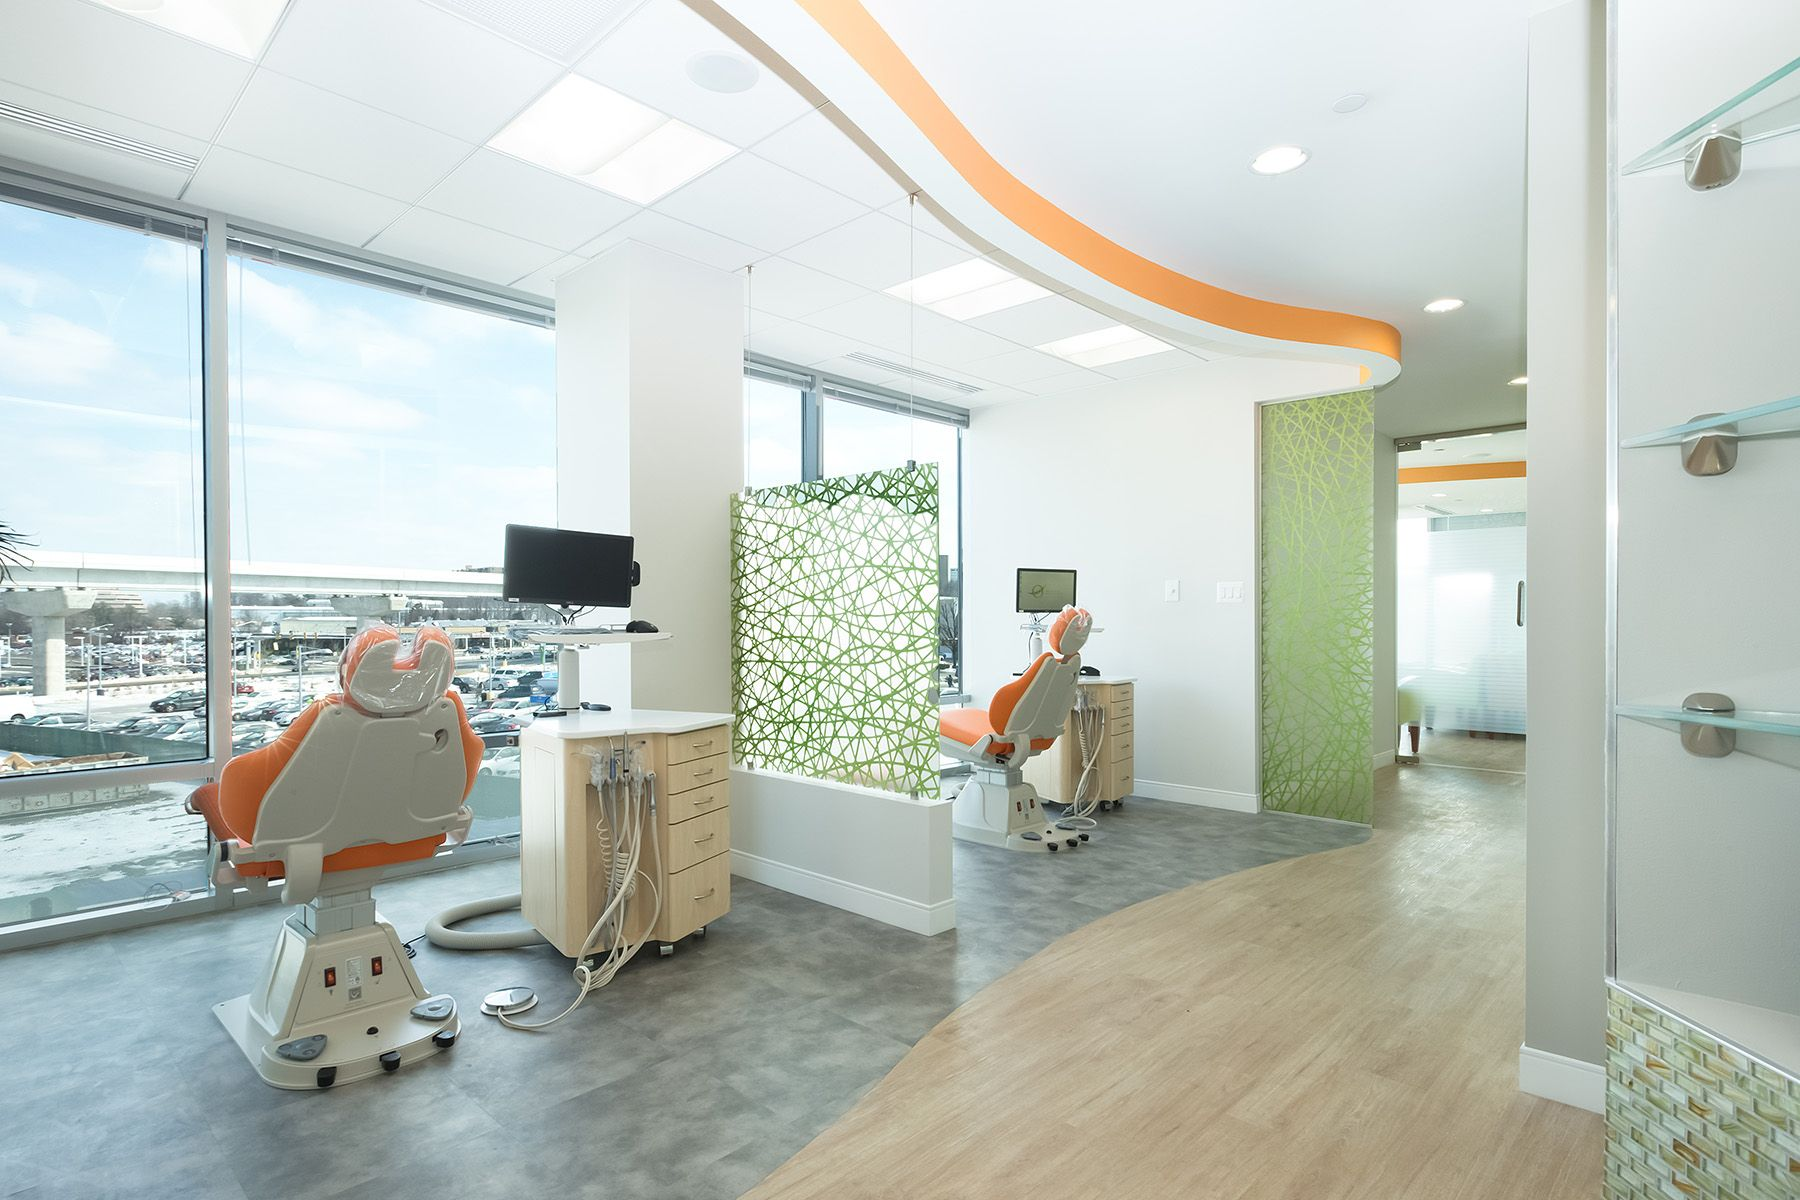 19++ South bay animal hospital ideas in 2021